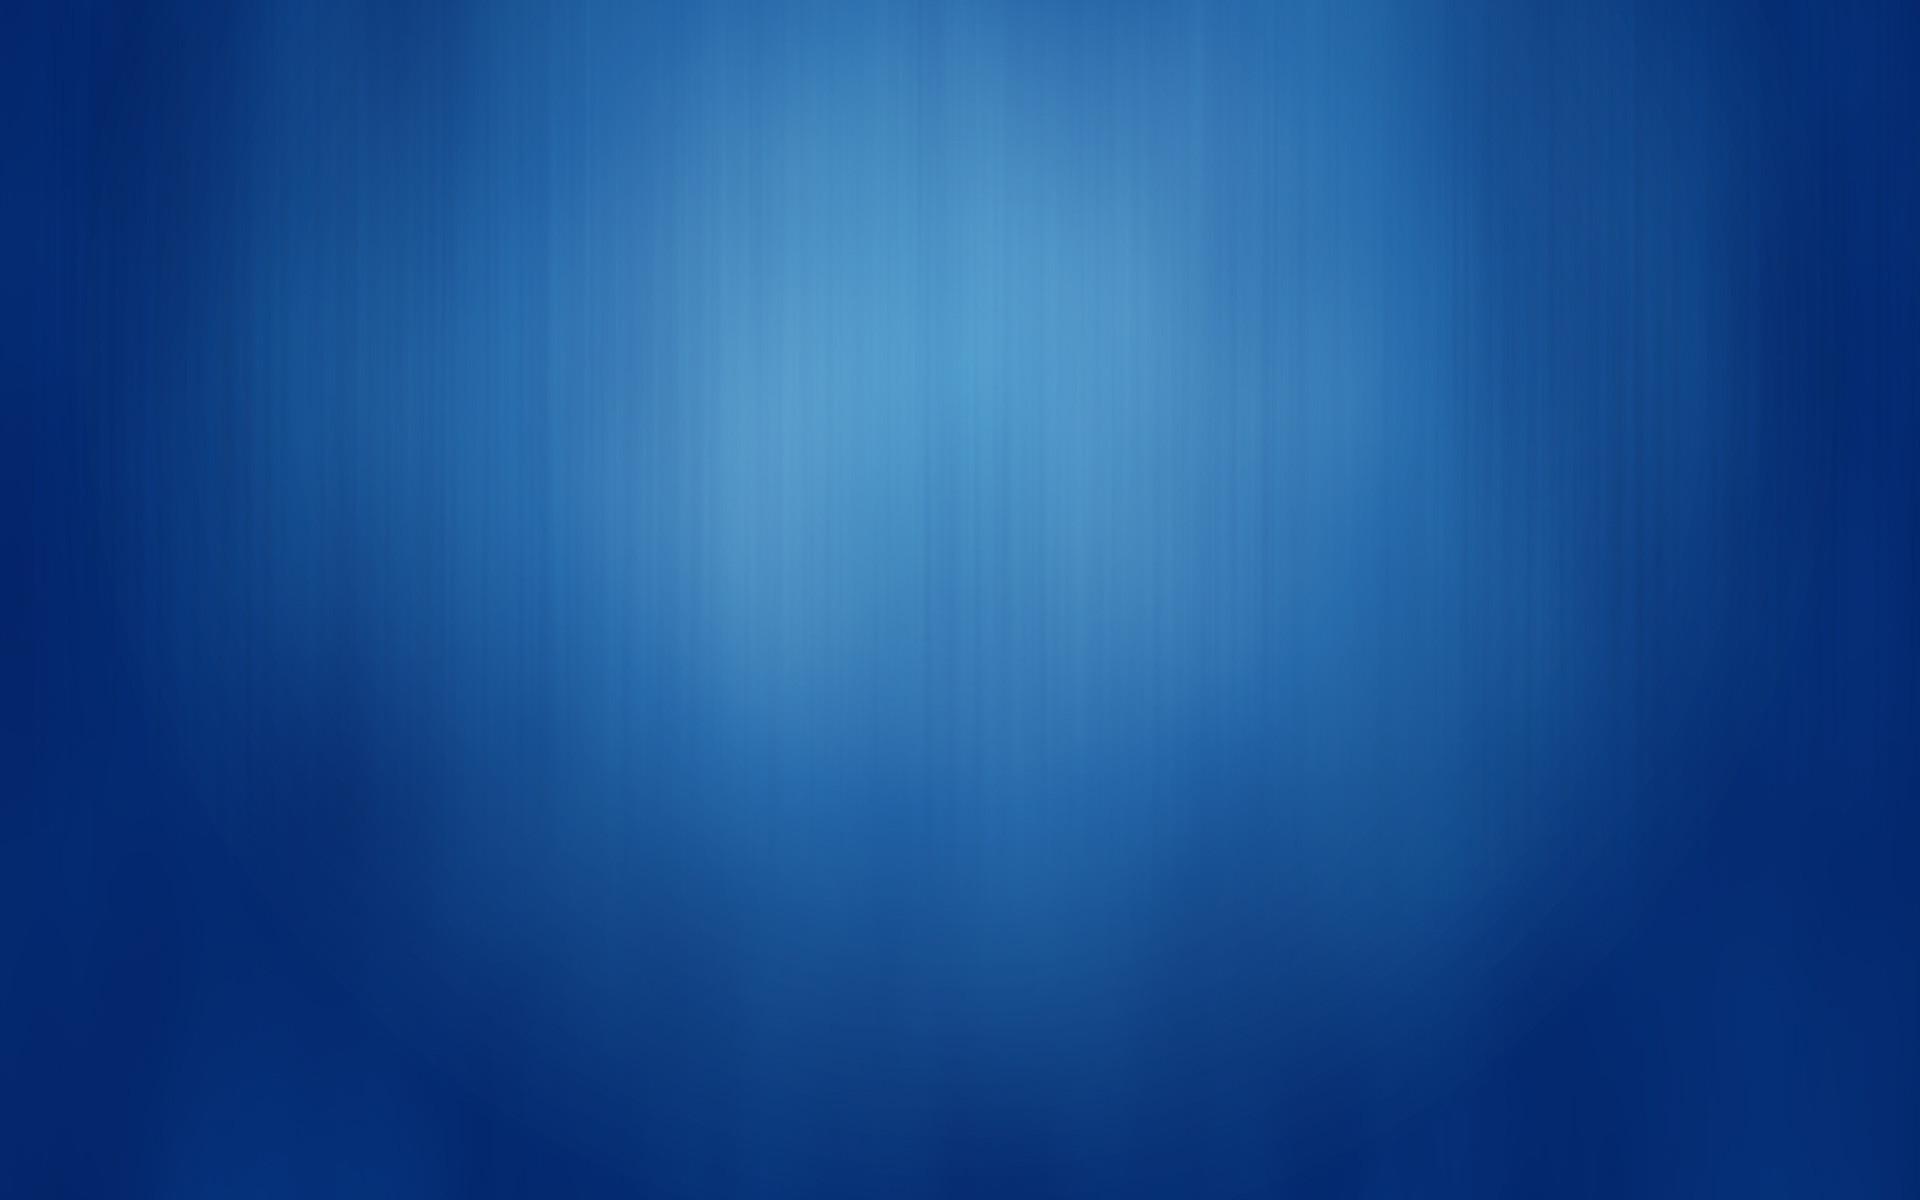 Window Blue Wallpaper Themes